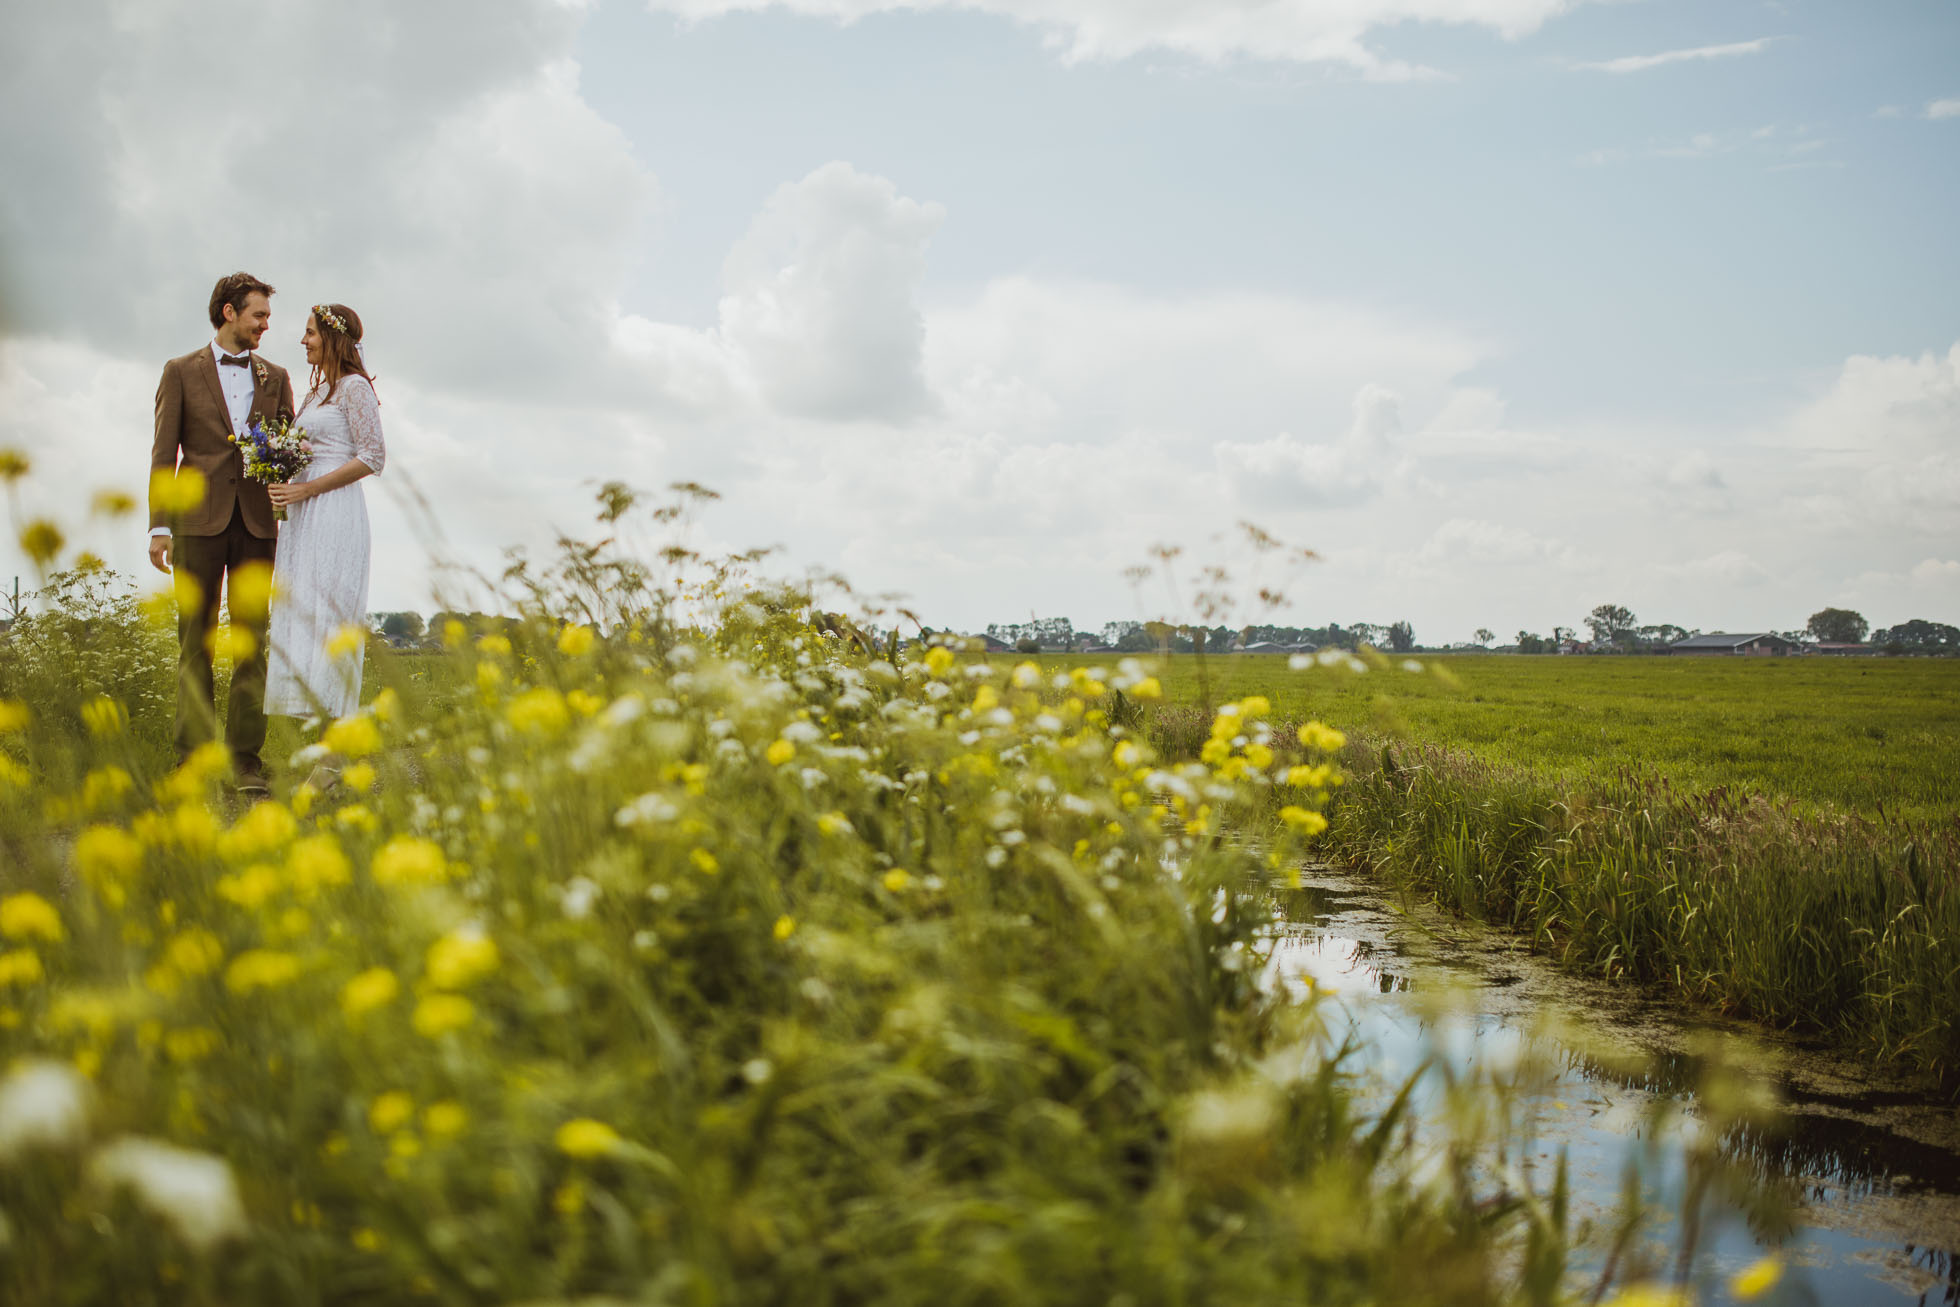 utrecht-wedding-photographer-30.jpg